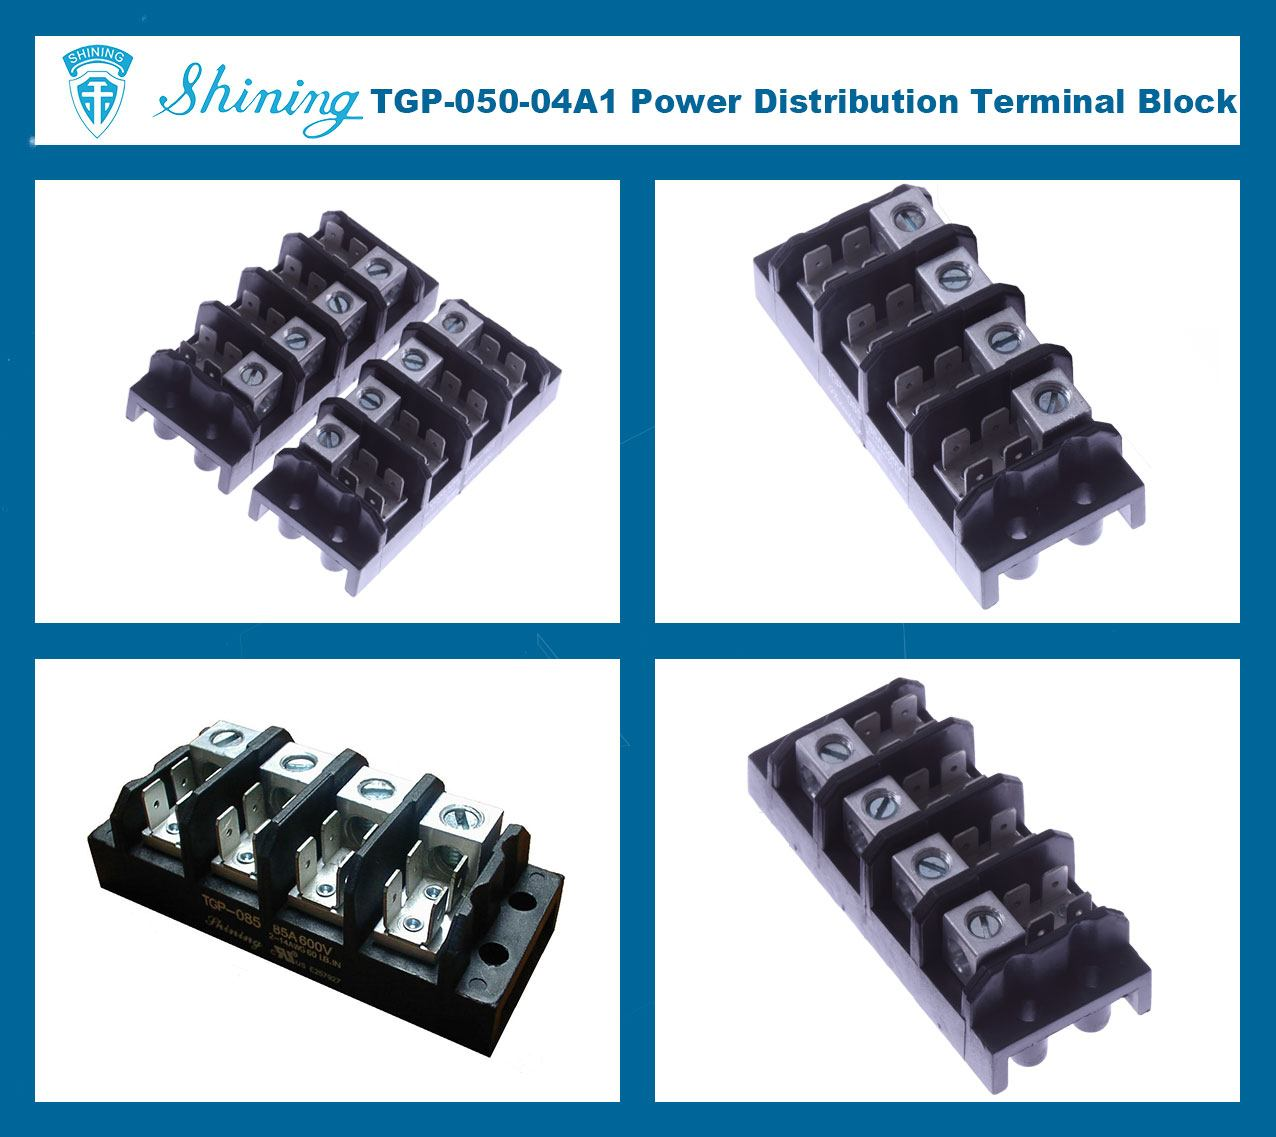 TGP-050-04A1 600V 50A 4 Pole Electrical Power Terminal Block